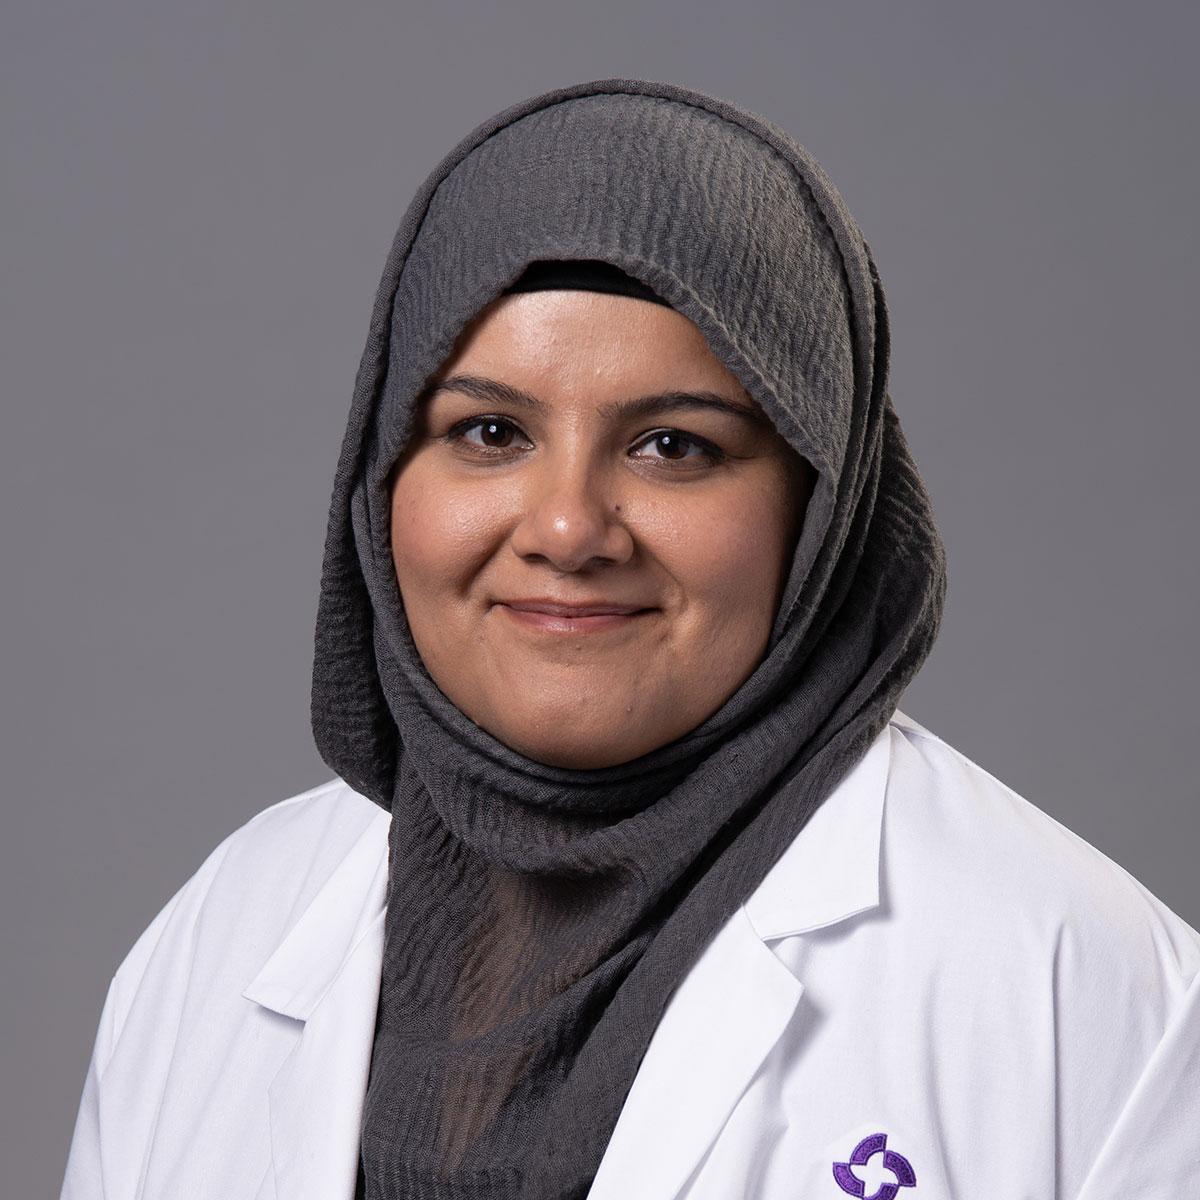 A friendly headshot of Dr. Javeria Naz